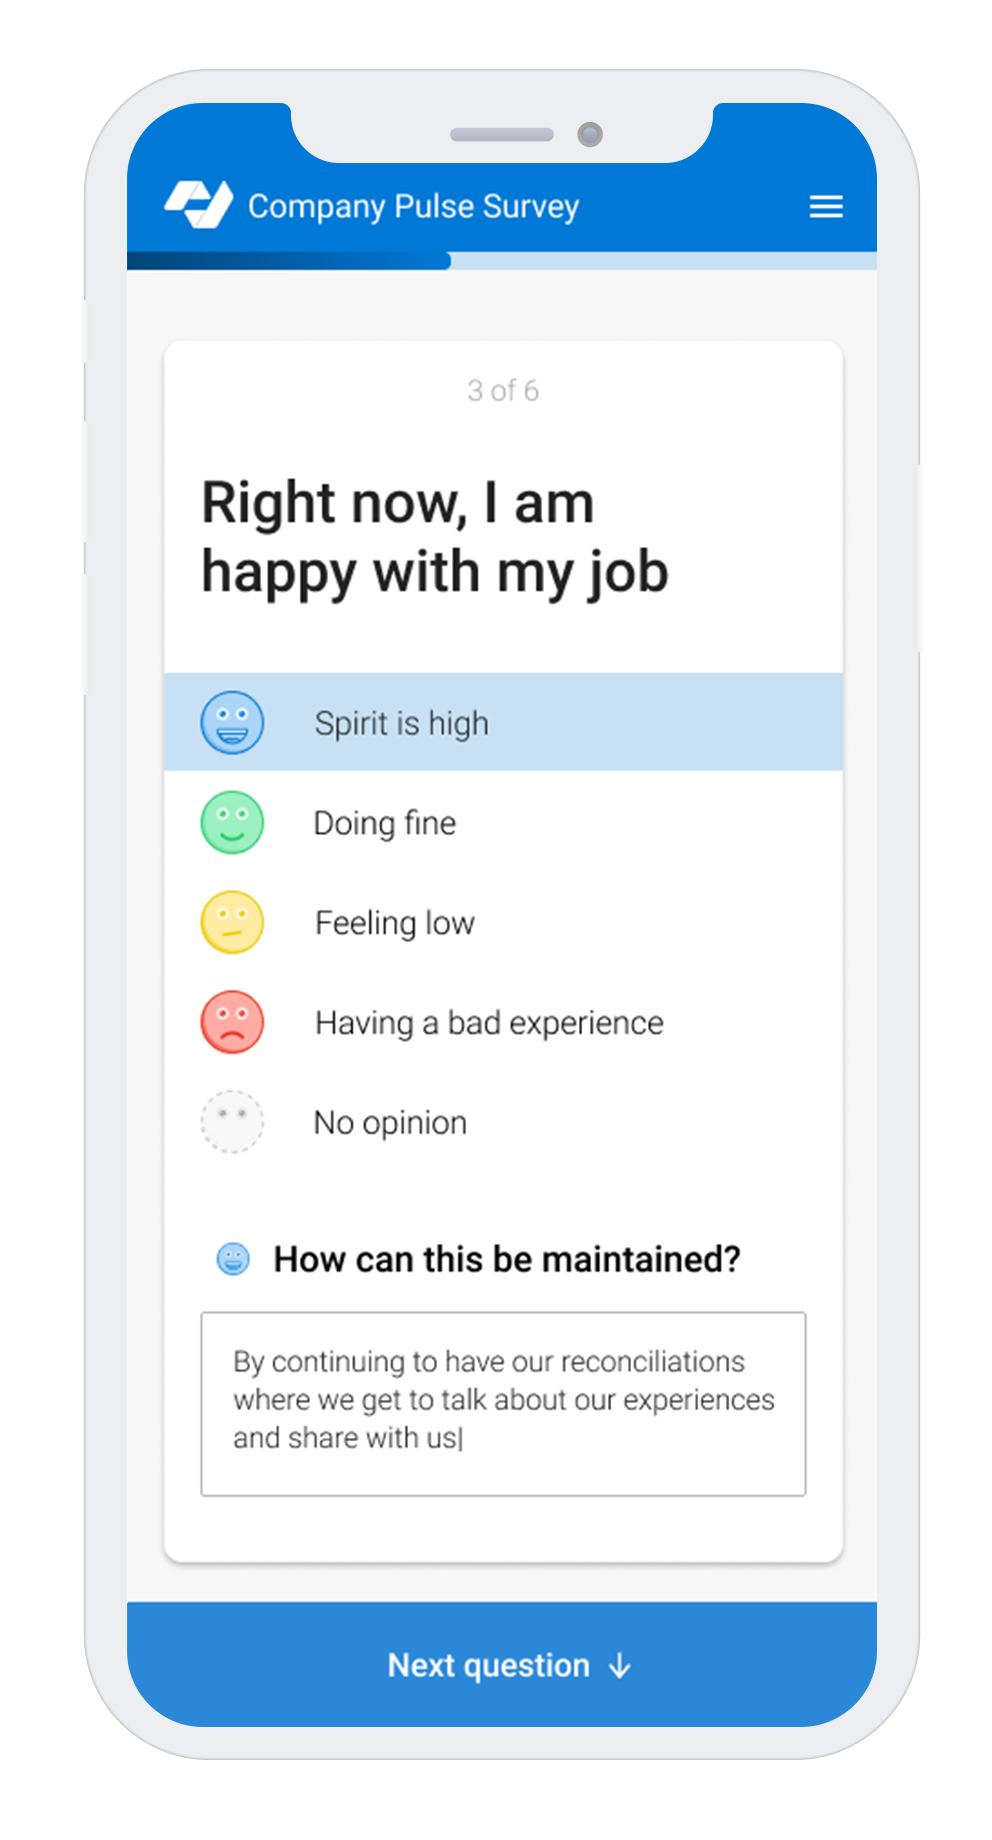 english populum pulse survey on an iphone